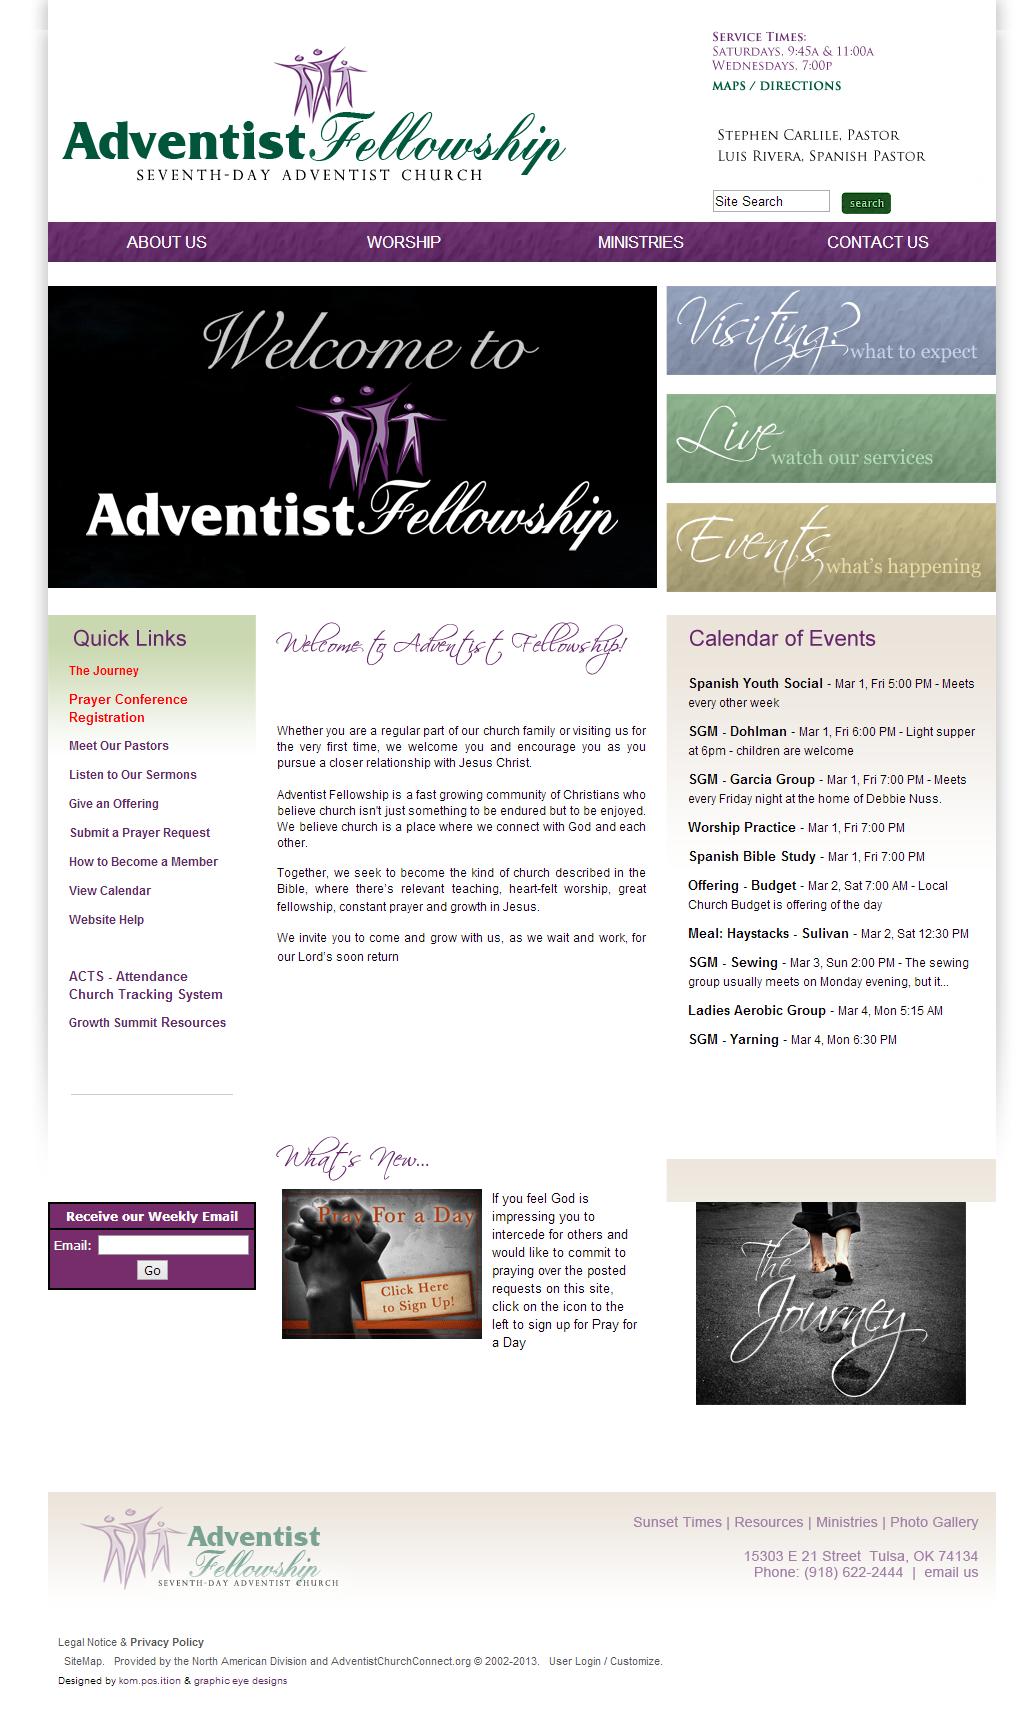 AdventistFellowship